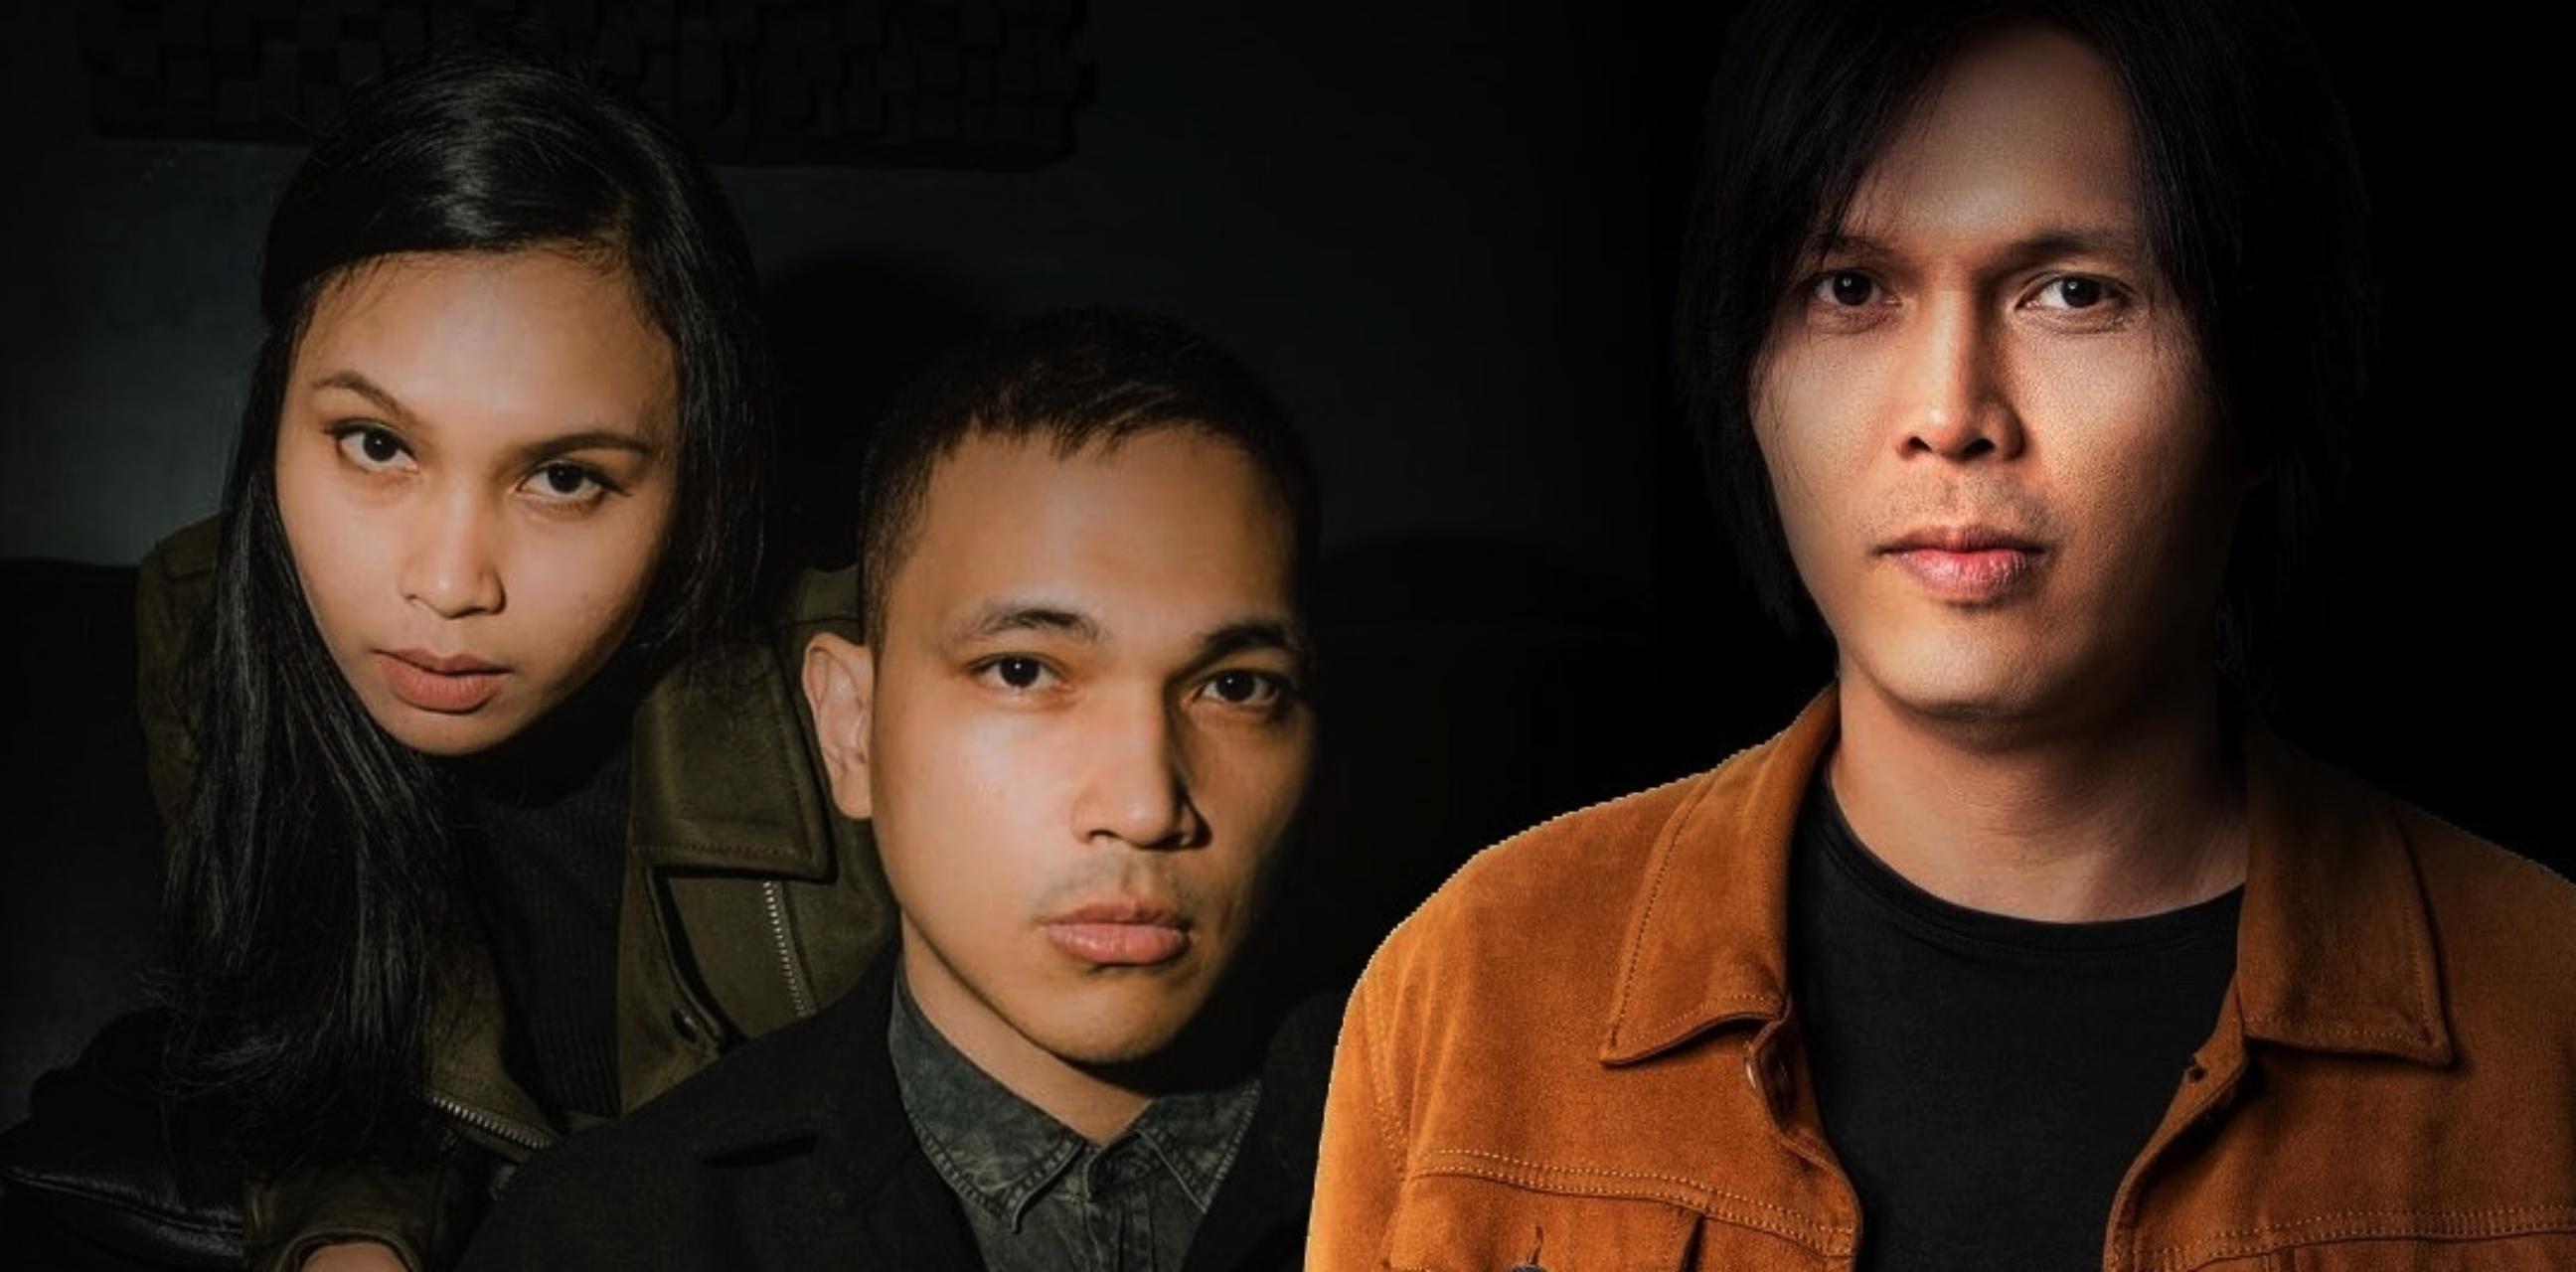 Supermusic gelar konser virtual kolaborasi Once Mekel & Scaller